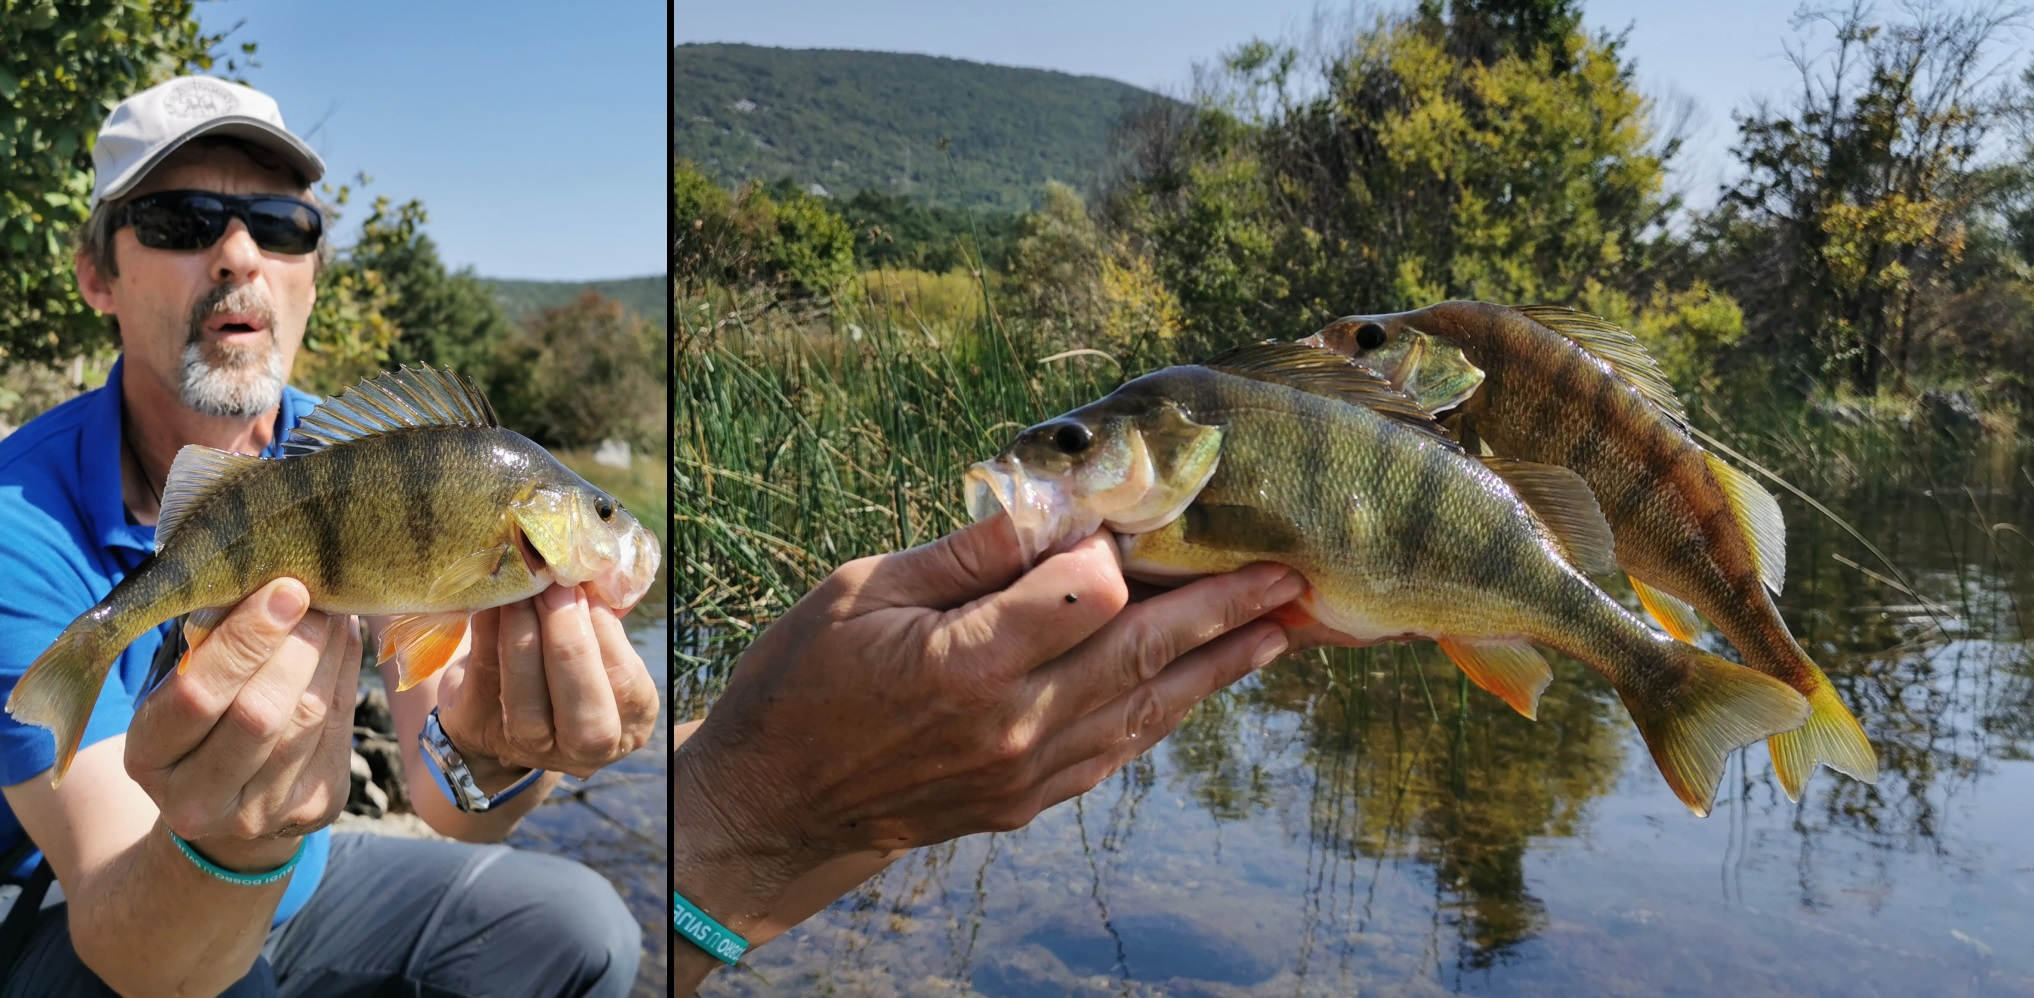 stikada ribolov spineri